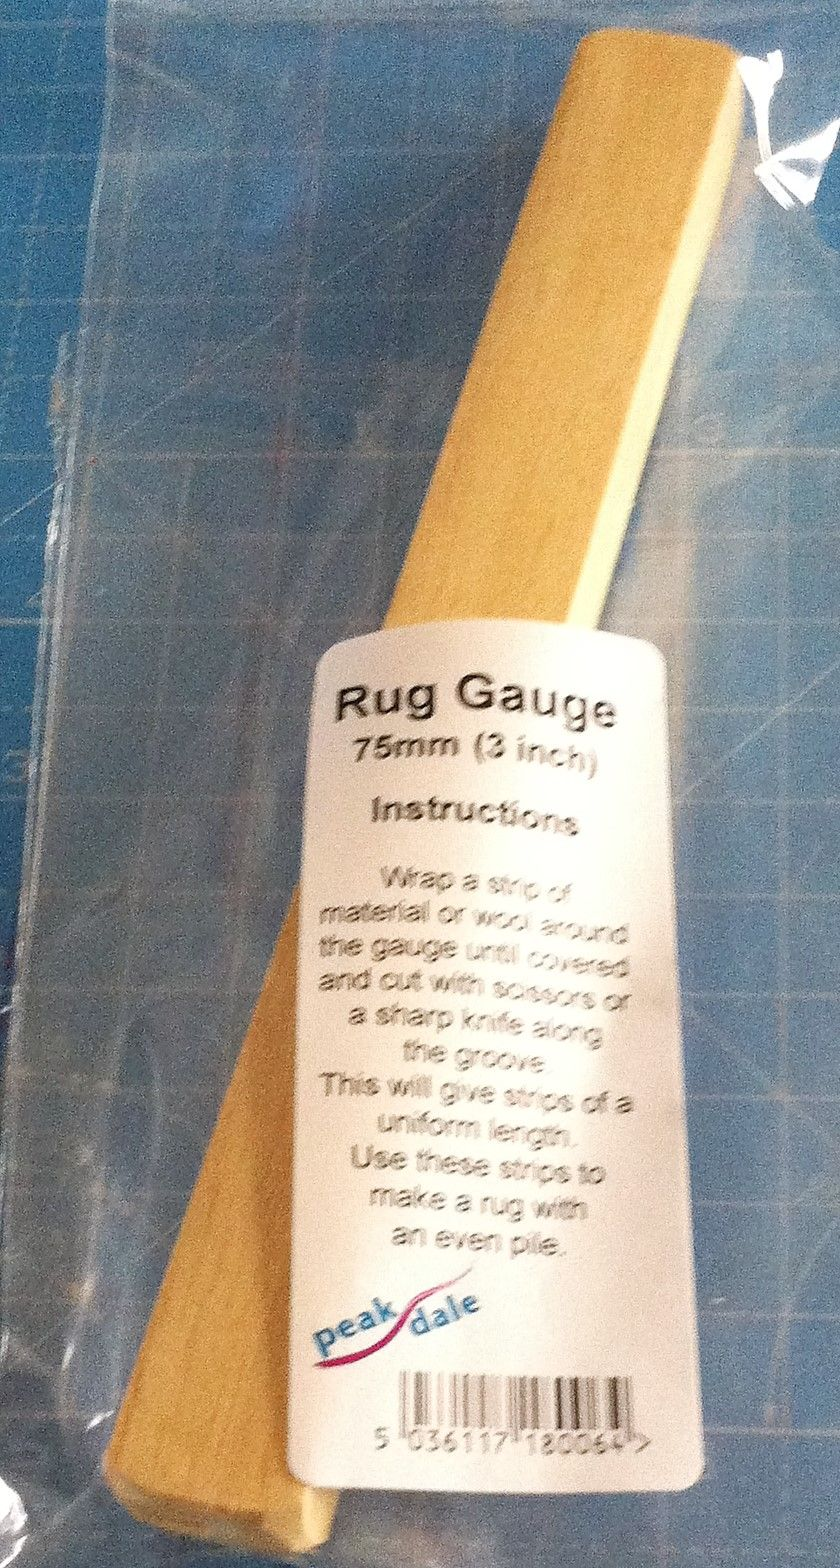 Rub gauge 3